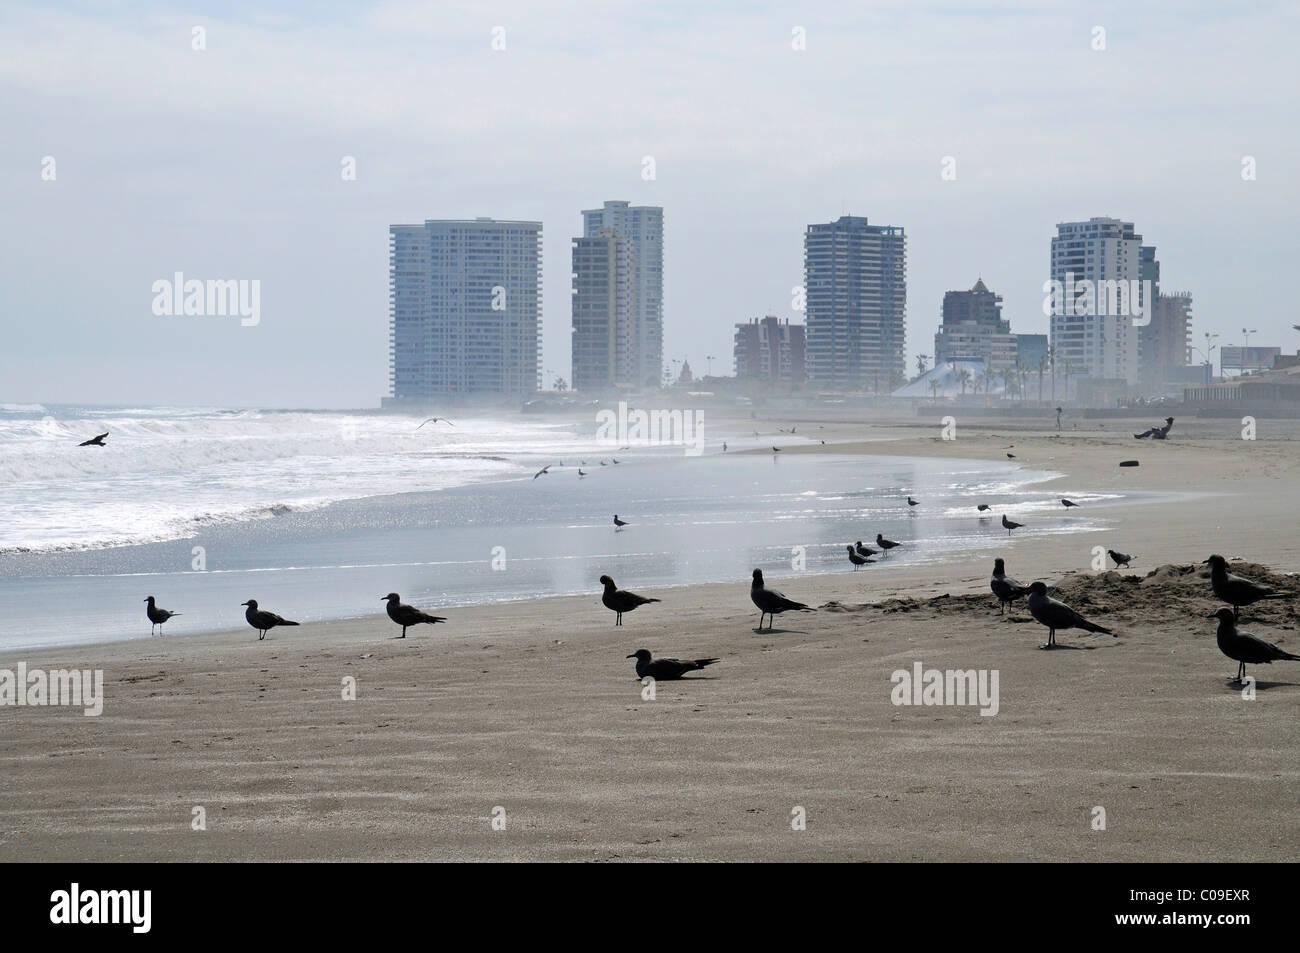 Seabirds, waves, multistory buildings, backlit, Playa Brava beach, empty beach, Iquique, Norte Grande, northern - Stock Image